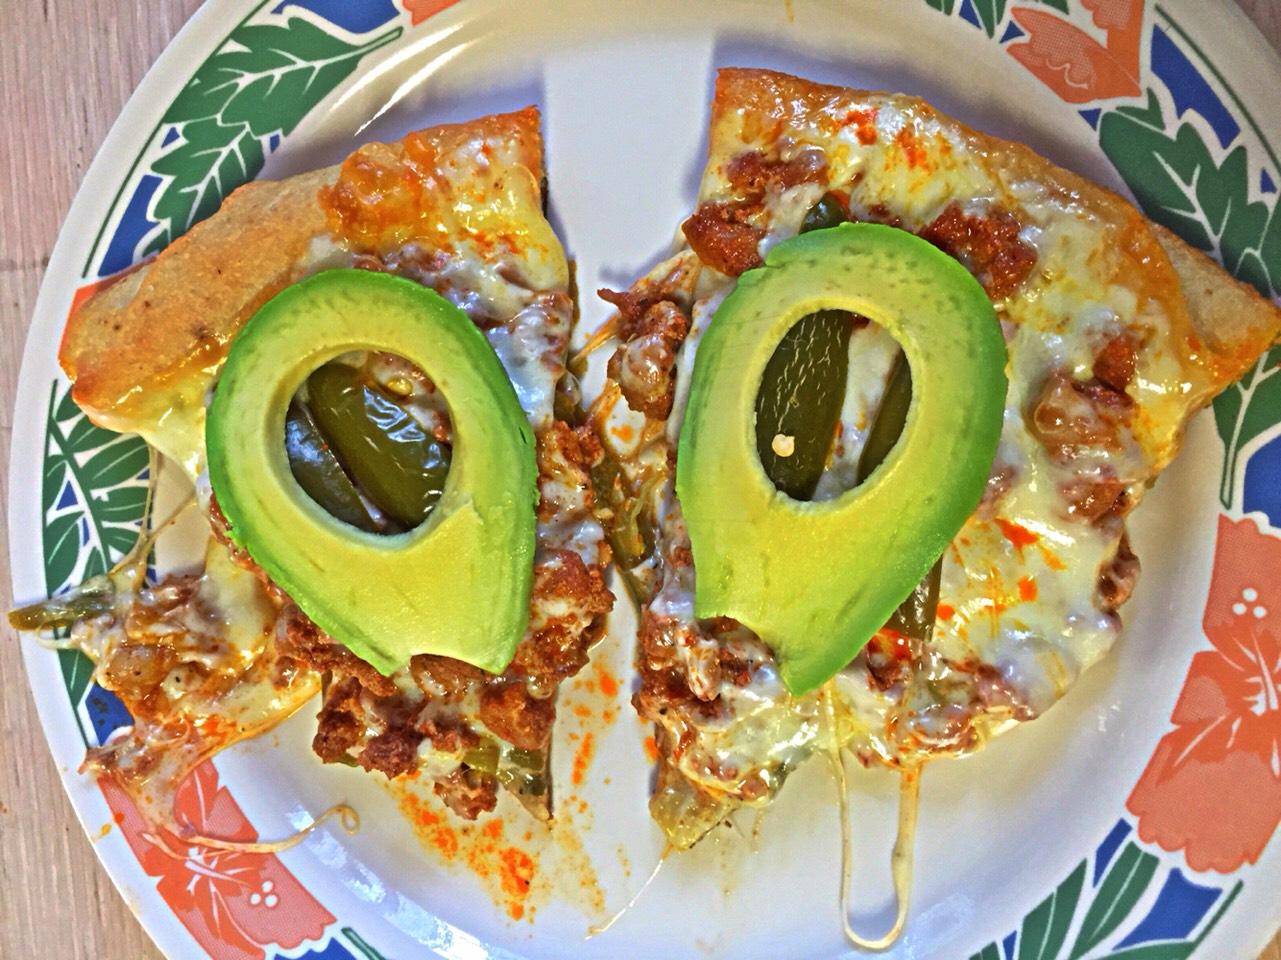 Garnish with fresh avocado.